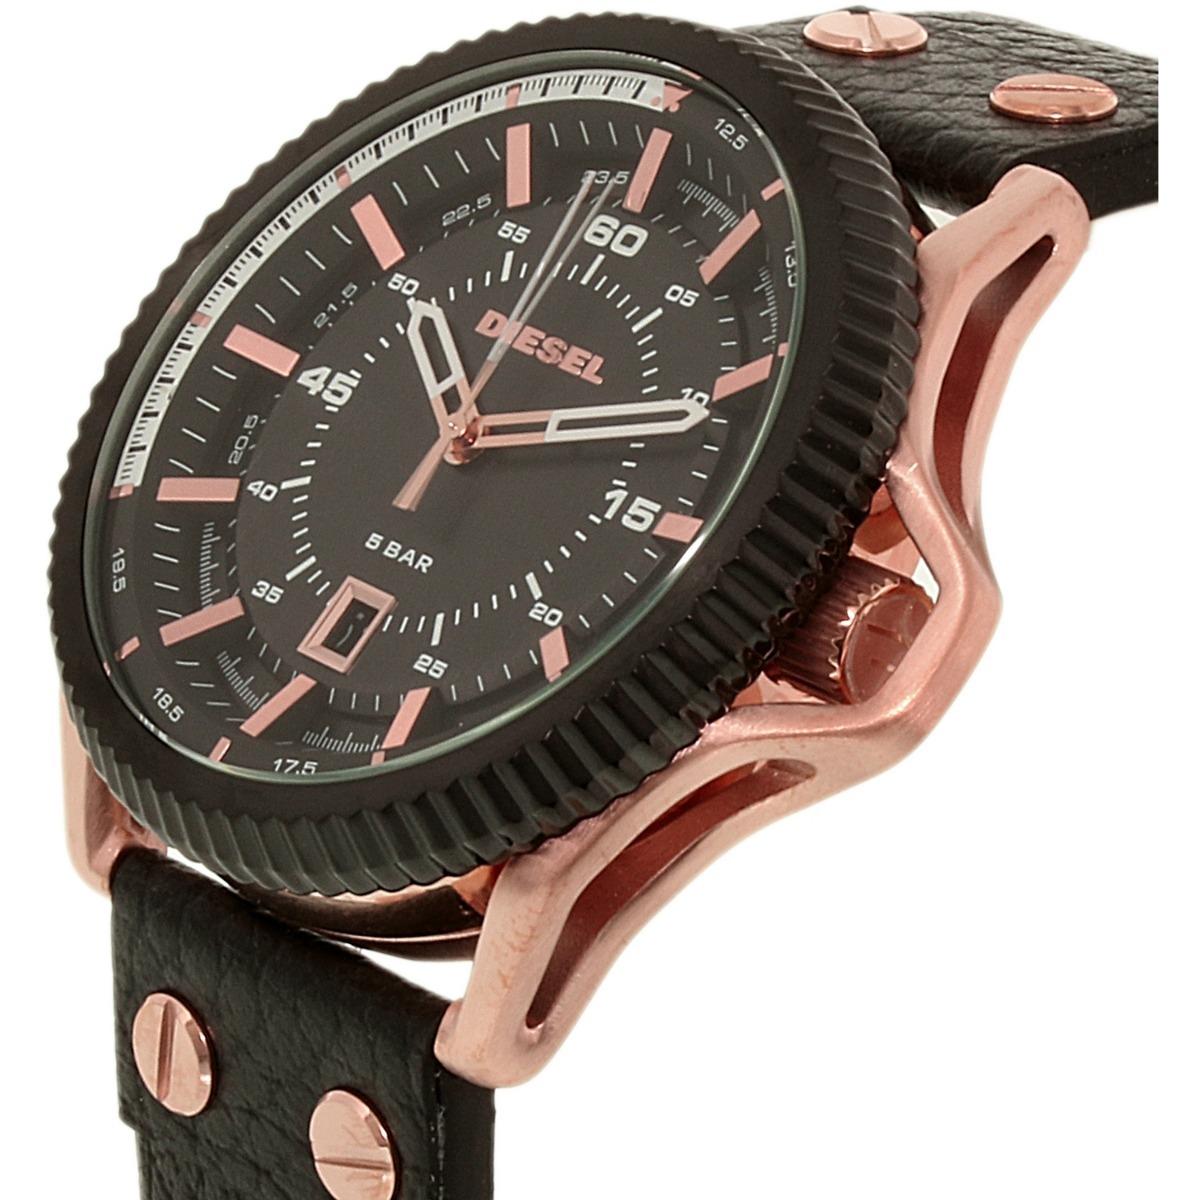 c2218a169783 Reloj Diesel Rollcage Rosa Dorado Dz1754 Para Caballero -   535.900 ...